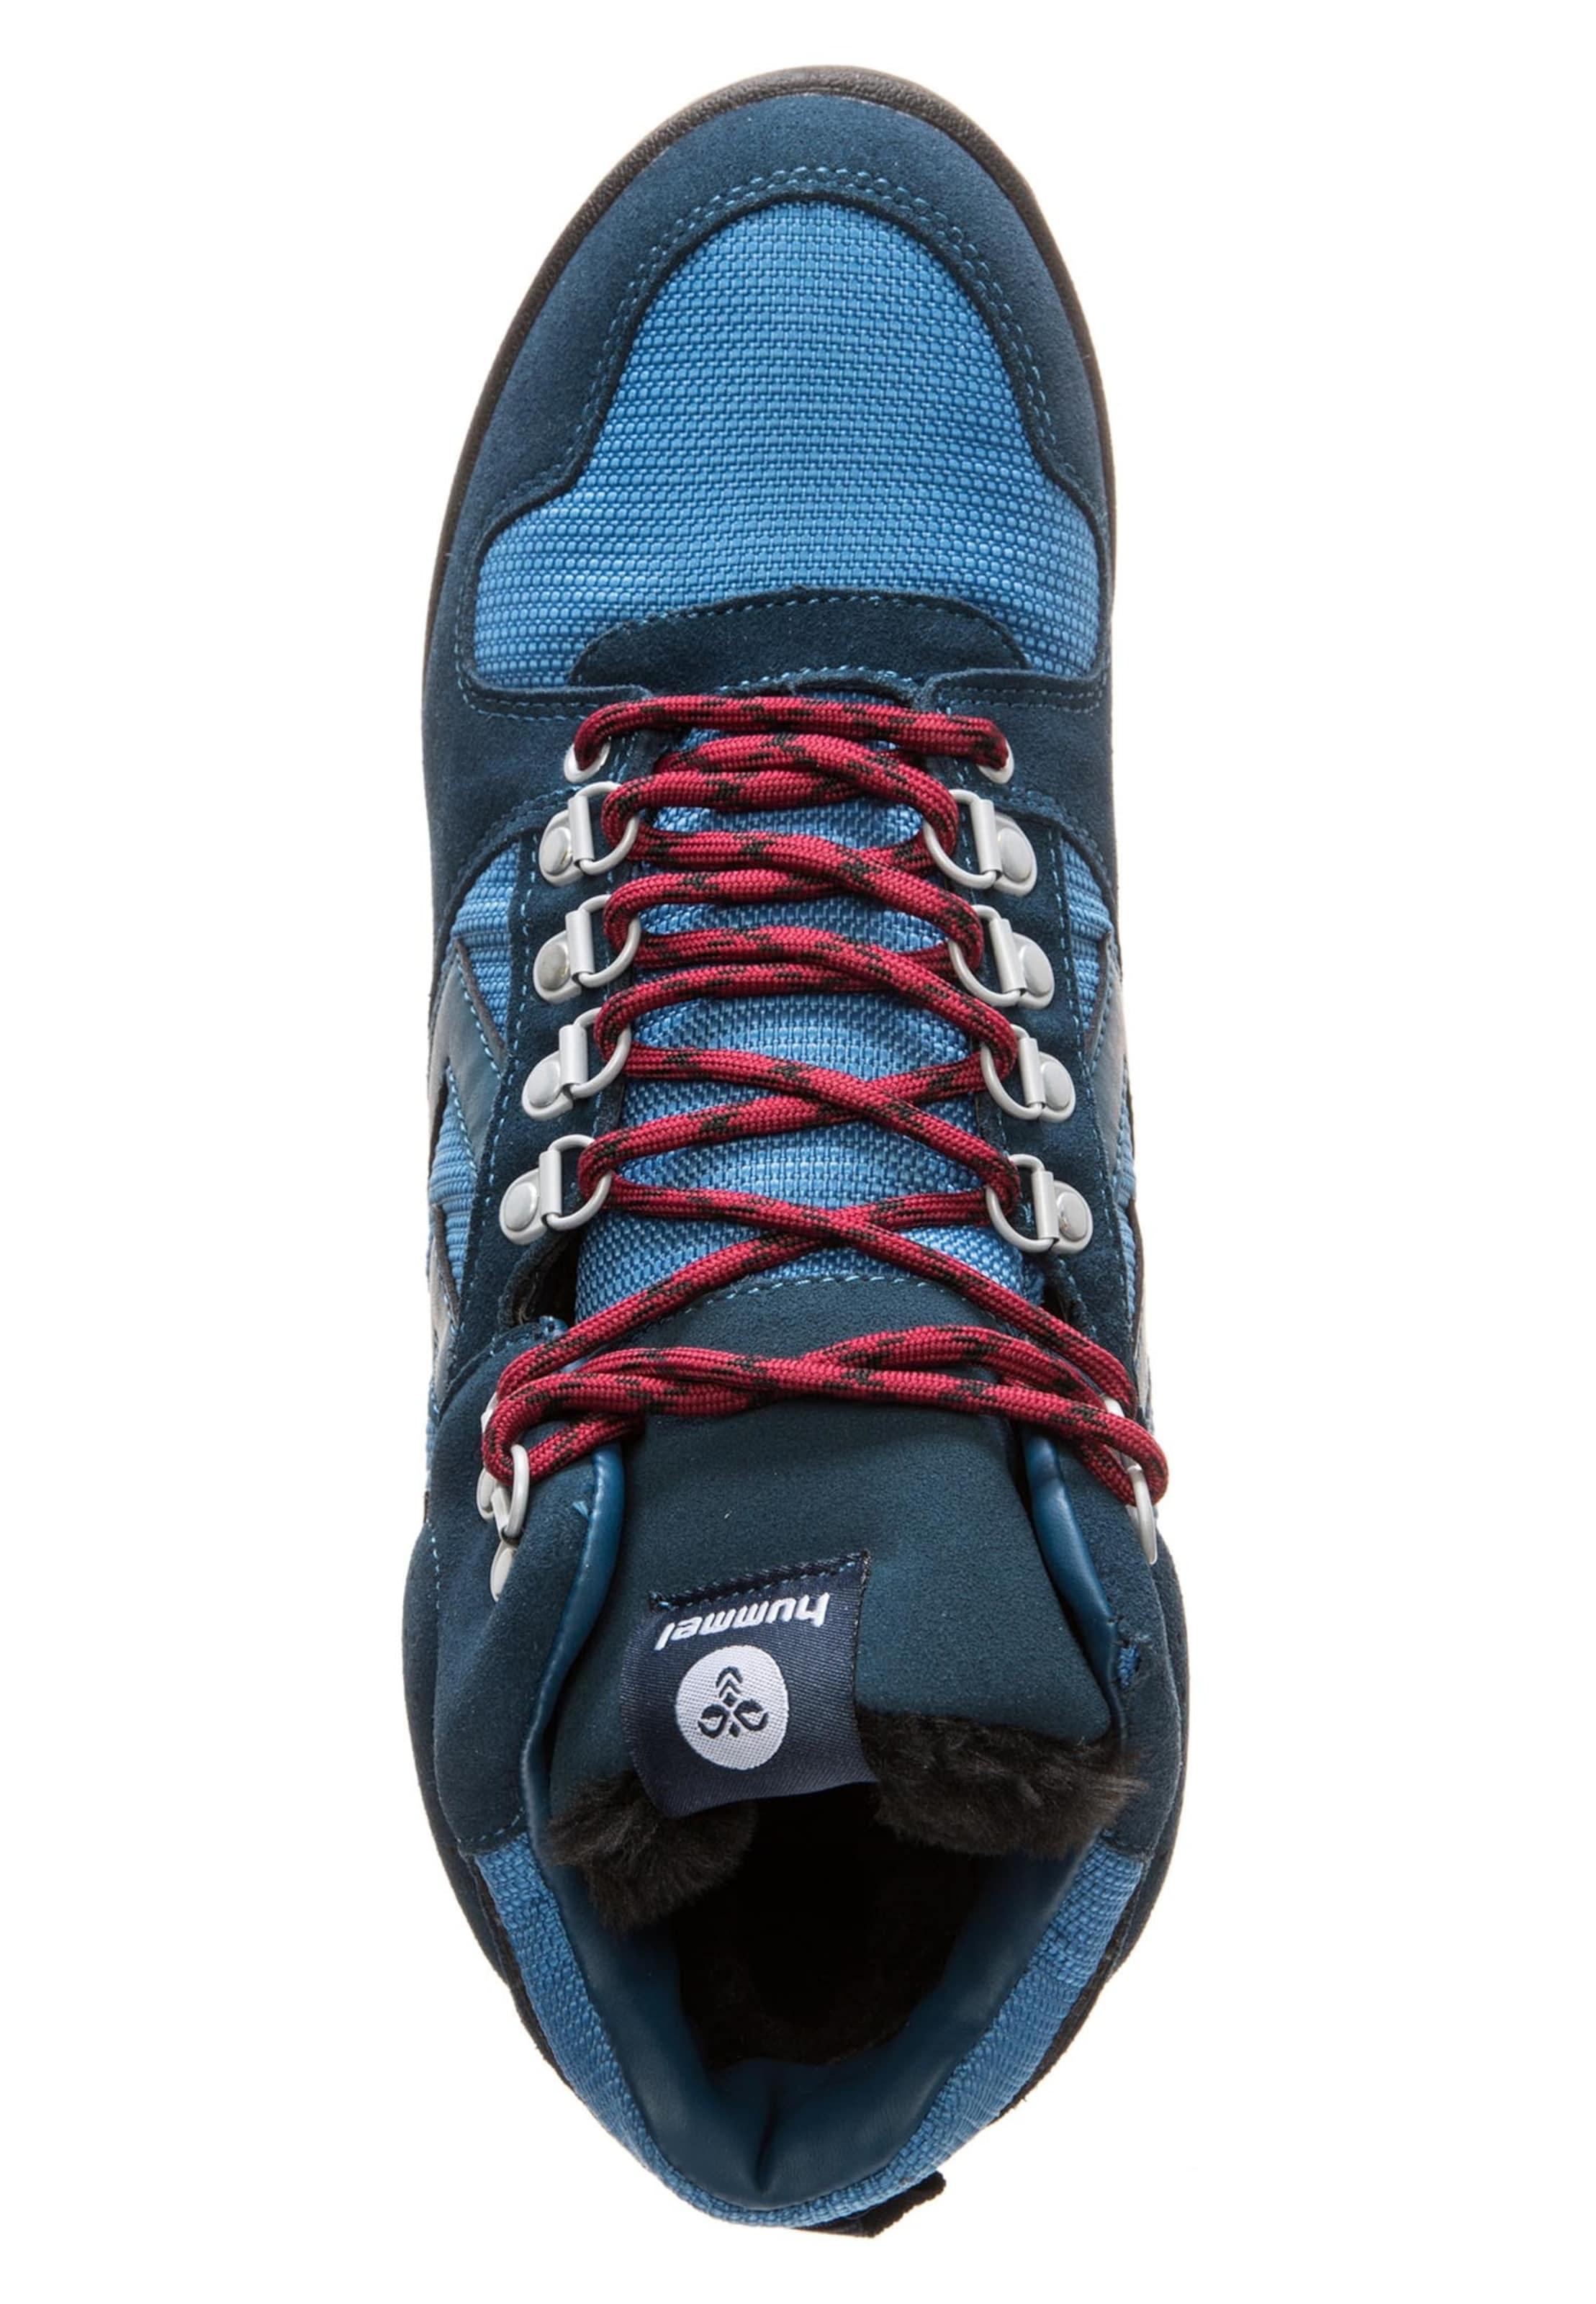 Weiß Sneaker Forest' Rot In RauchblauHimmelblau Root Hummel Schwarz 'nordic kPZuOXi